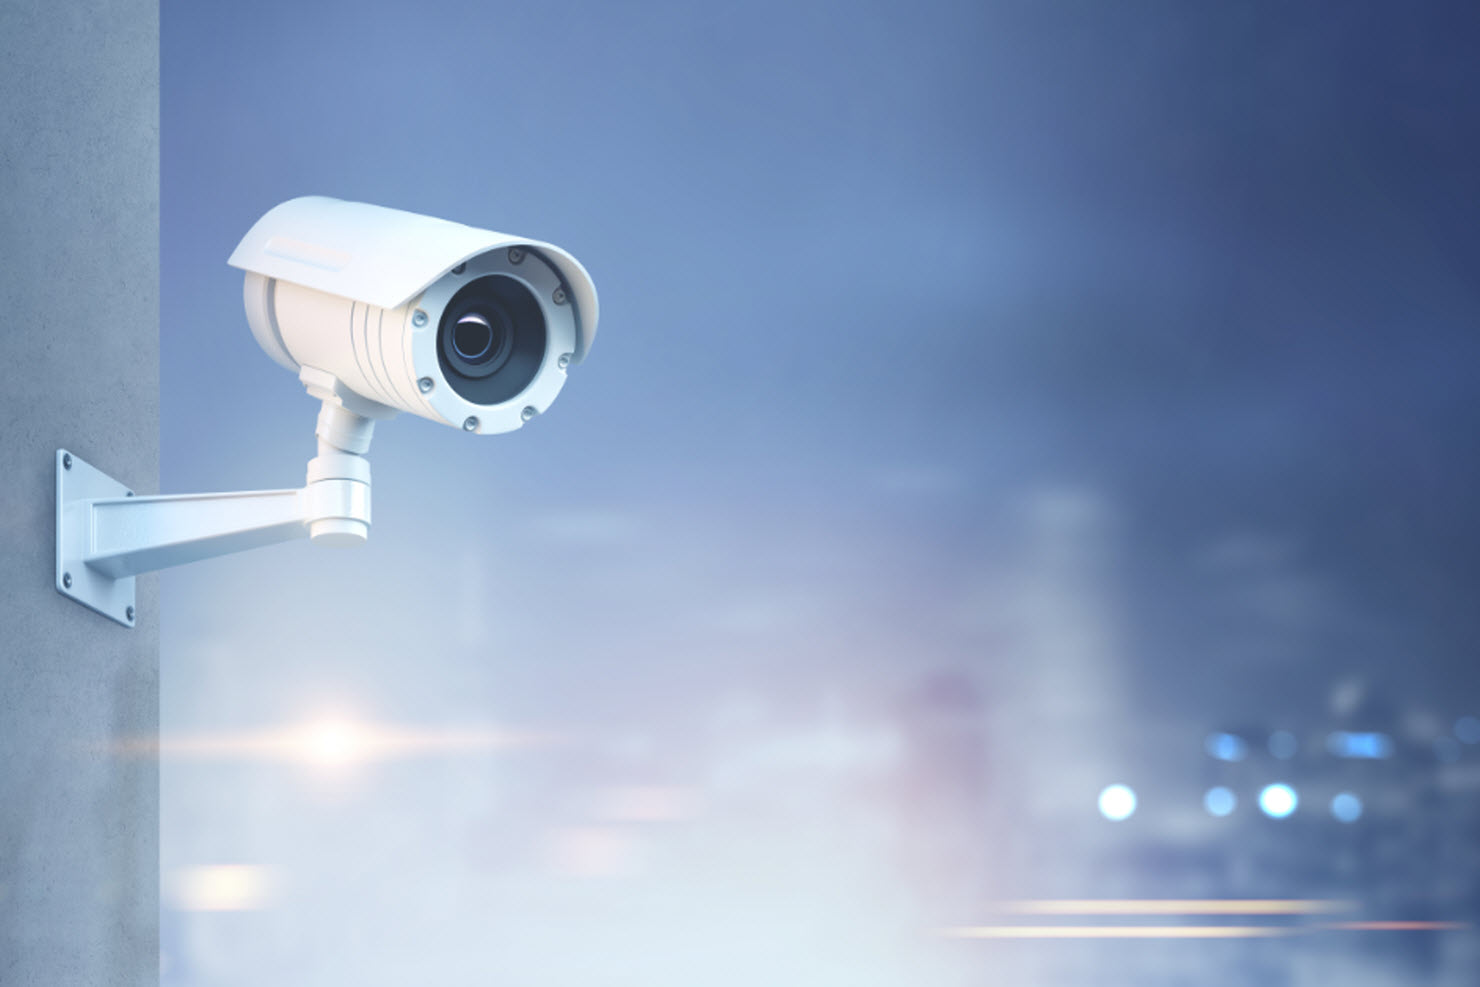 Requisitos de validez de videovigilancia para acreditar despido